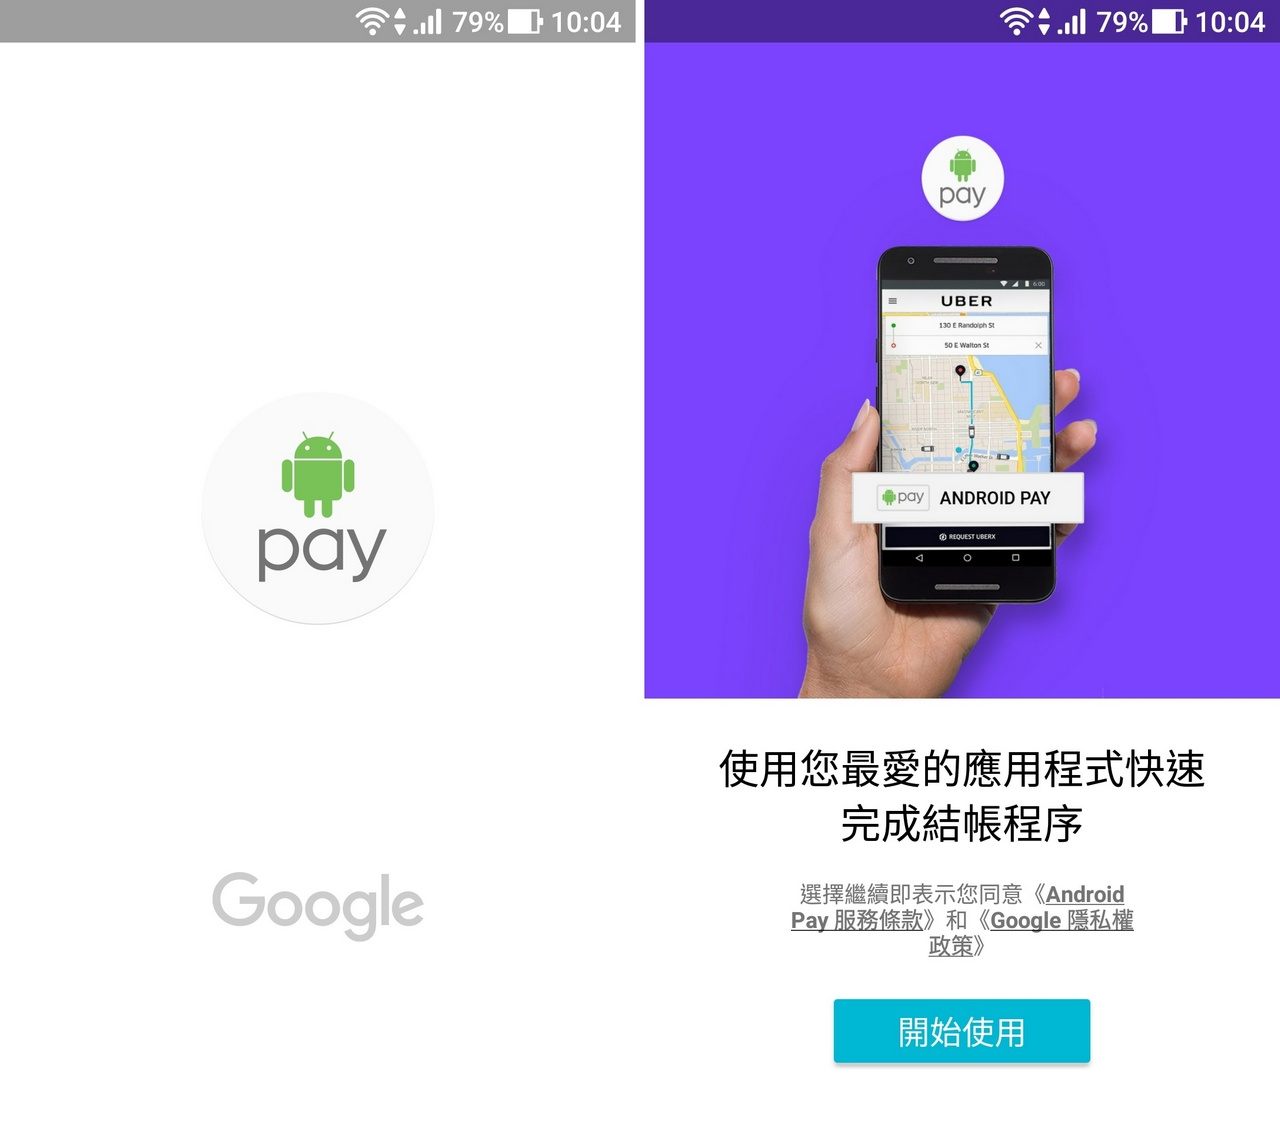 Android Pay 正式登場 快速更安全的支付方式